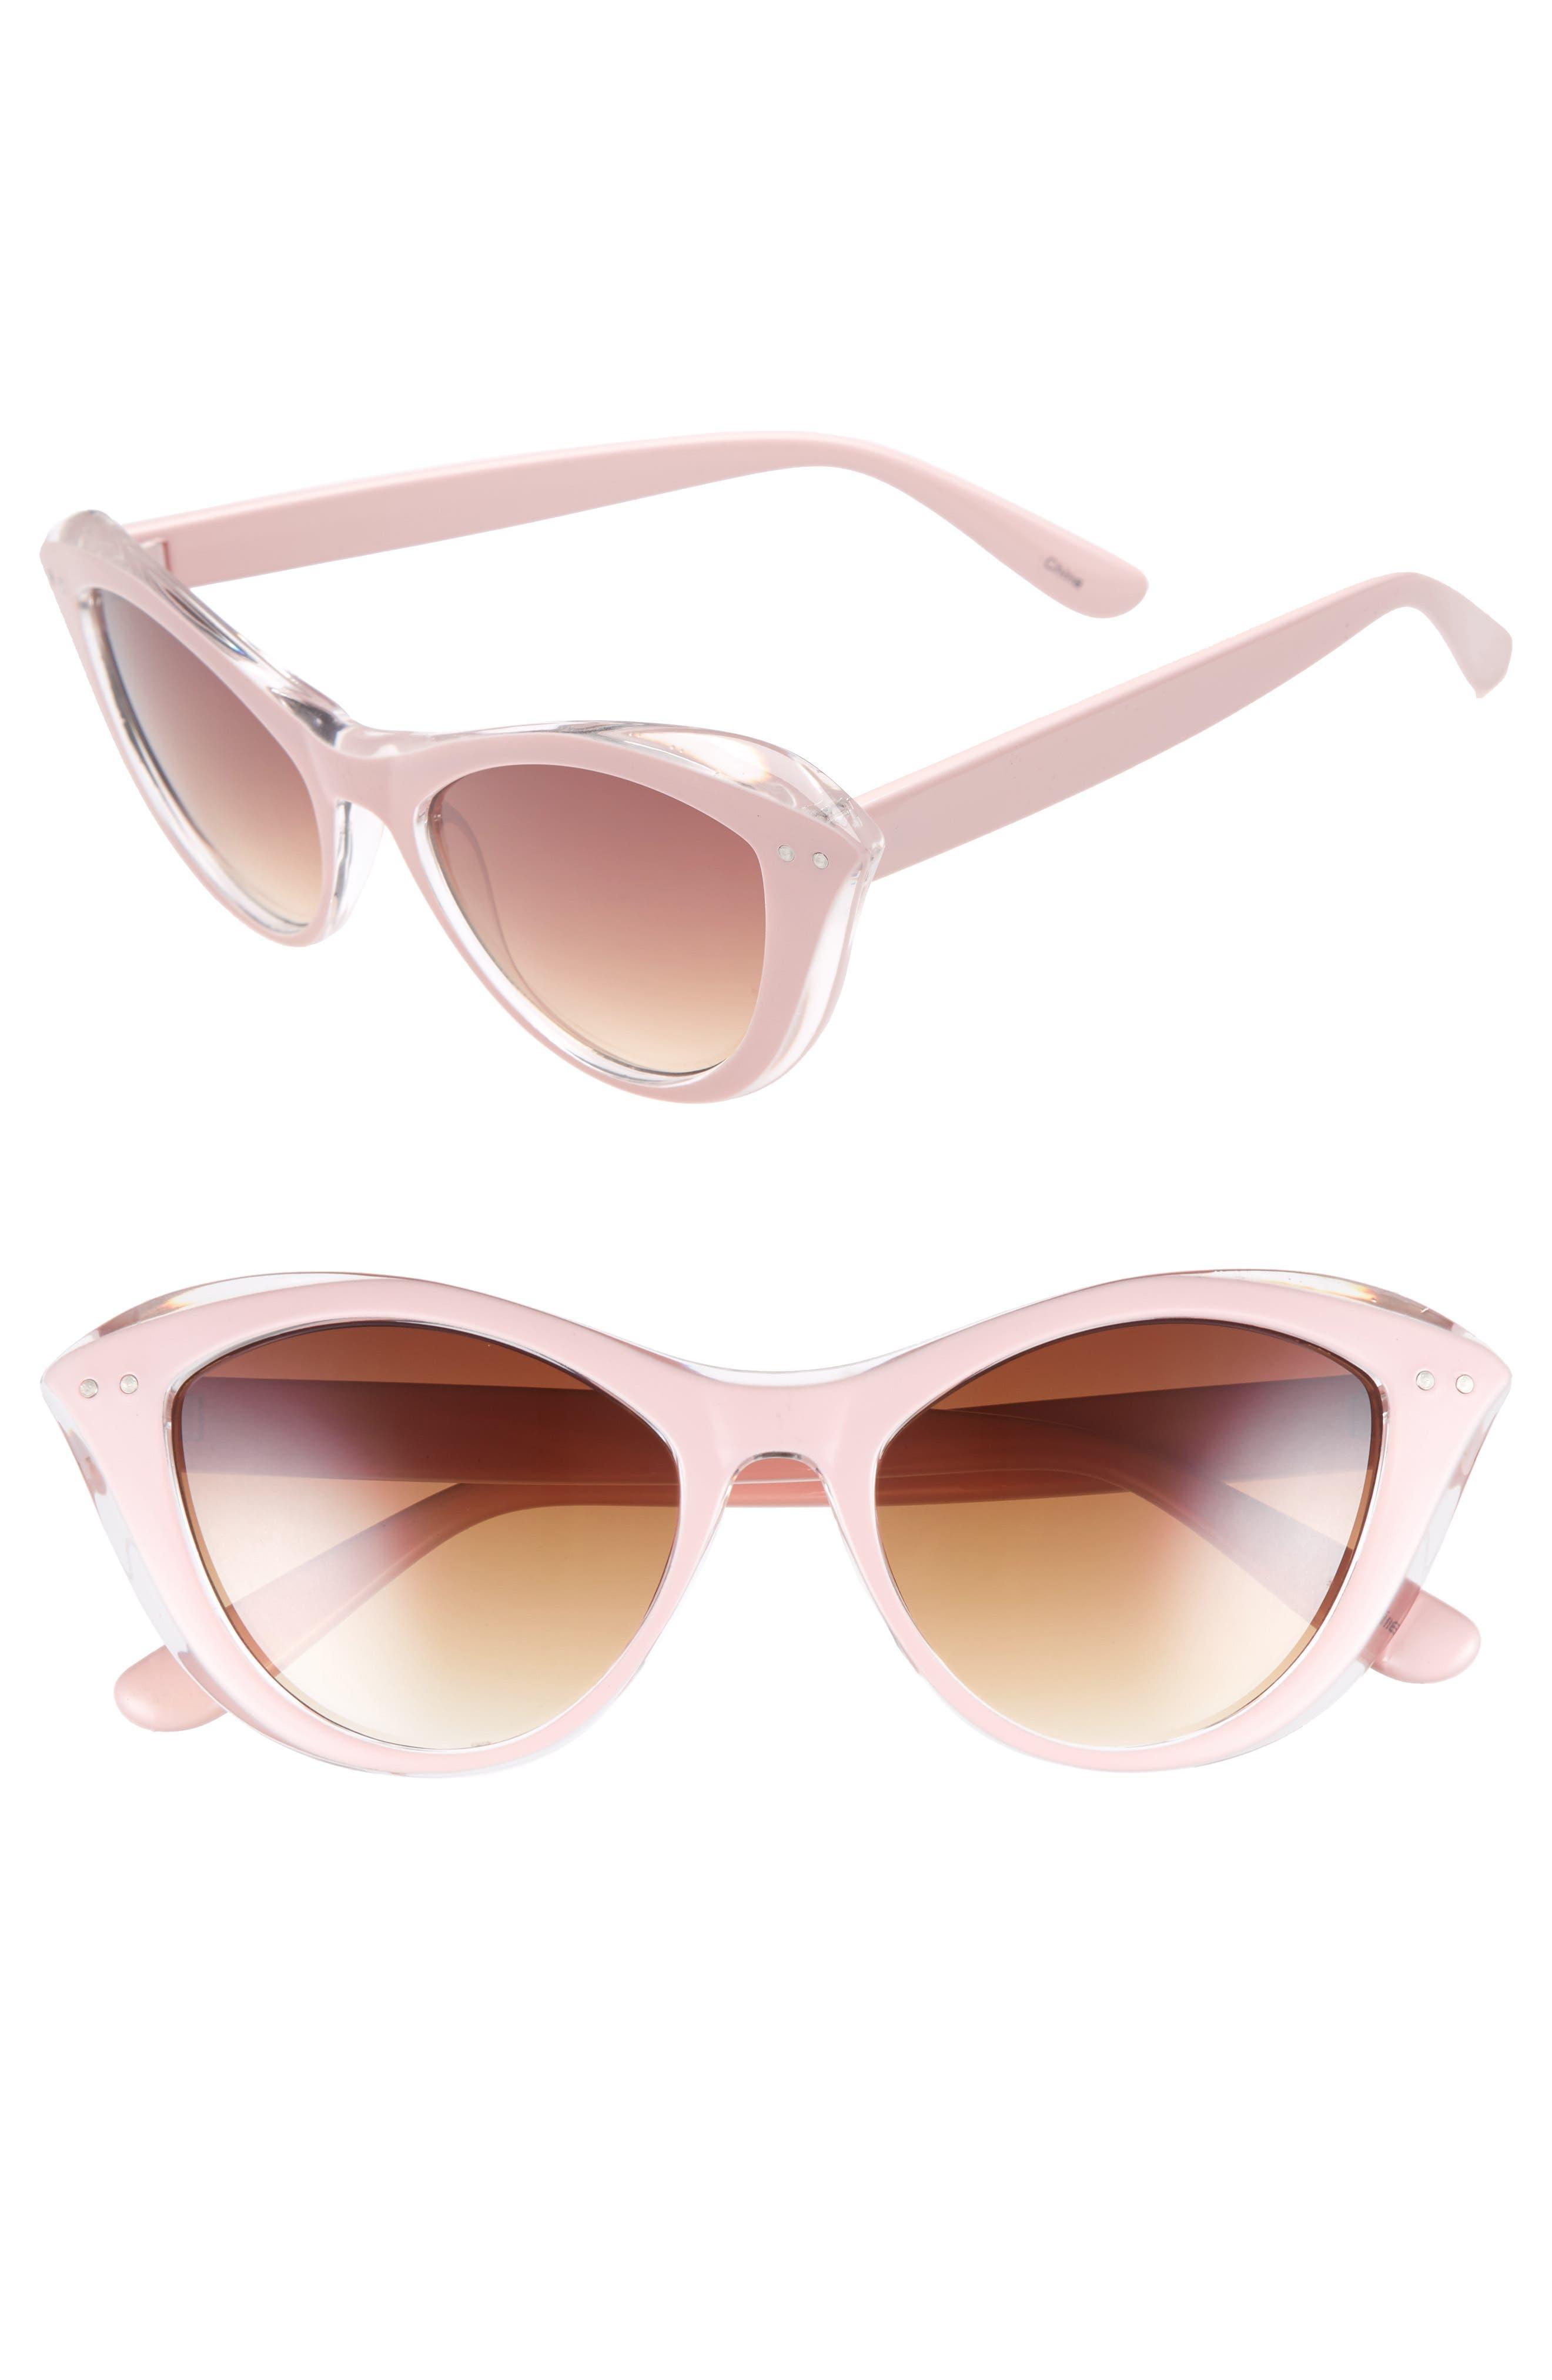 50mm Retro Cat Eye Sunglasses,                             Main thumbnail 1, color,                             Pink